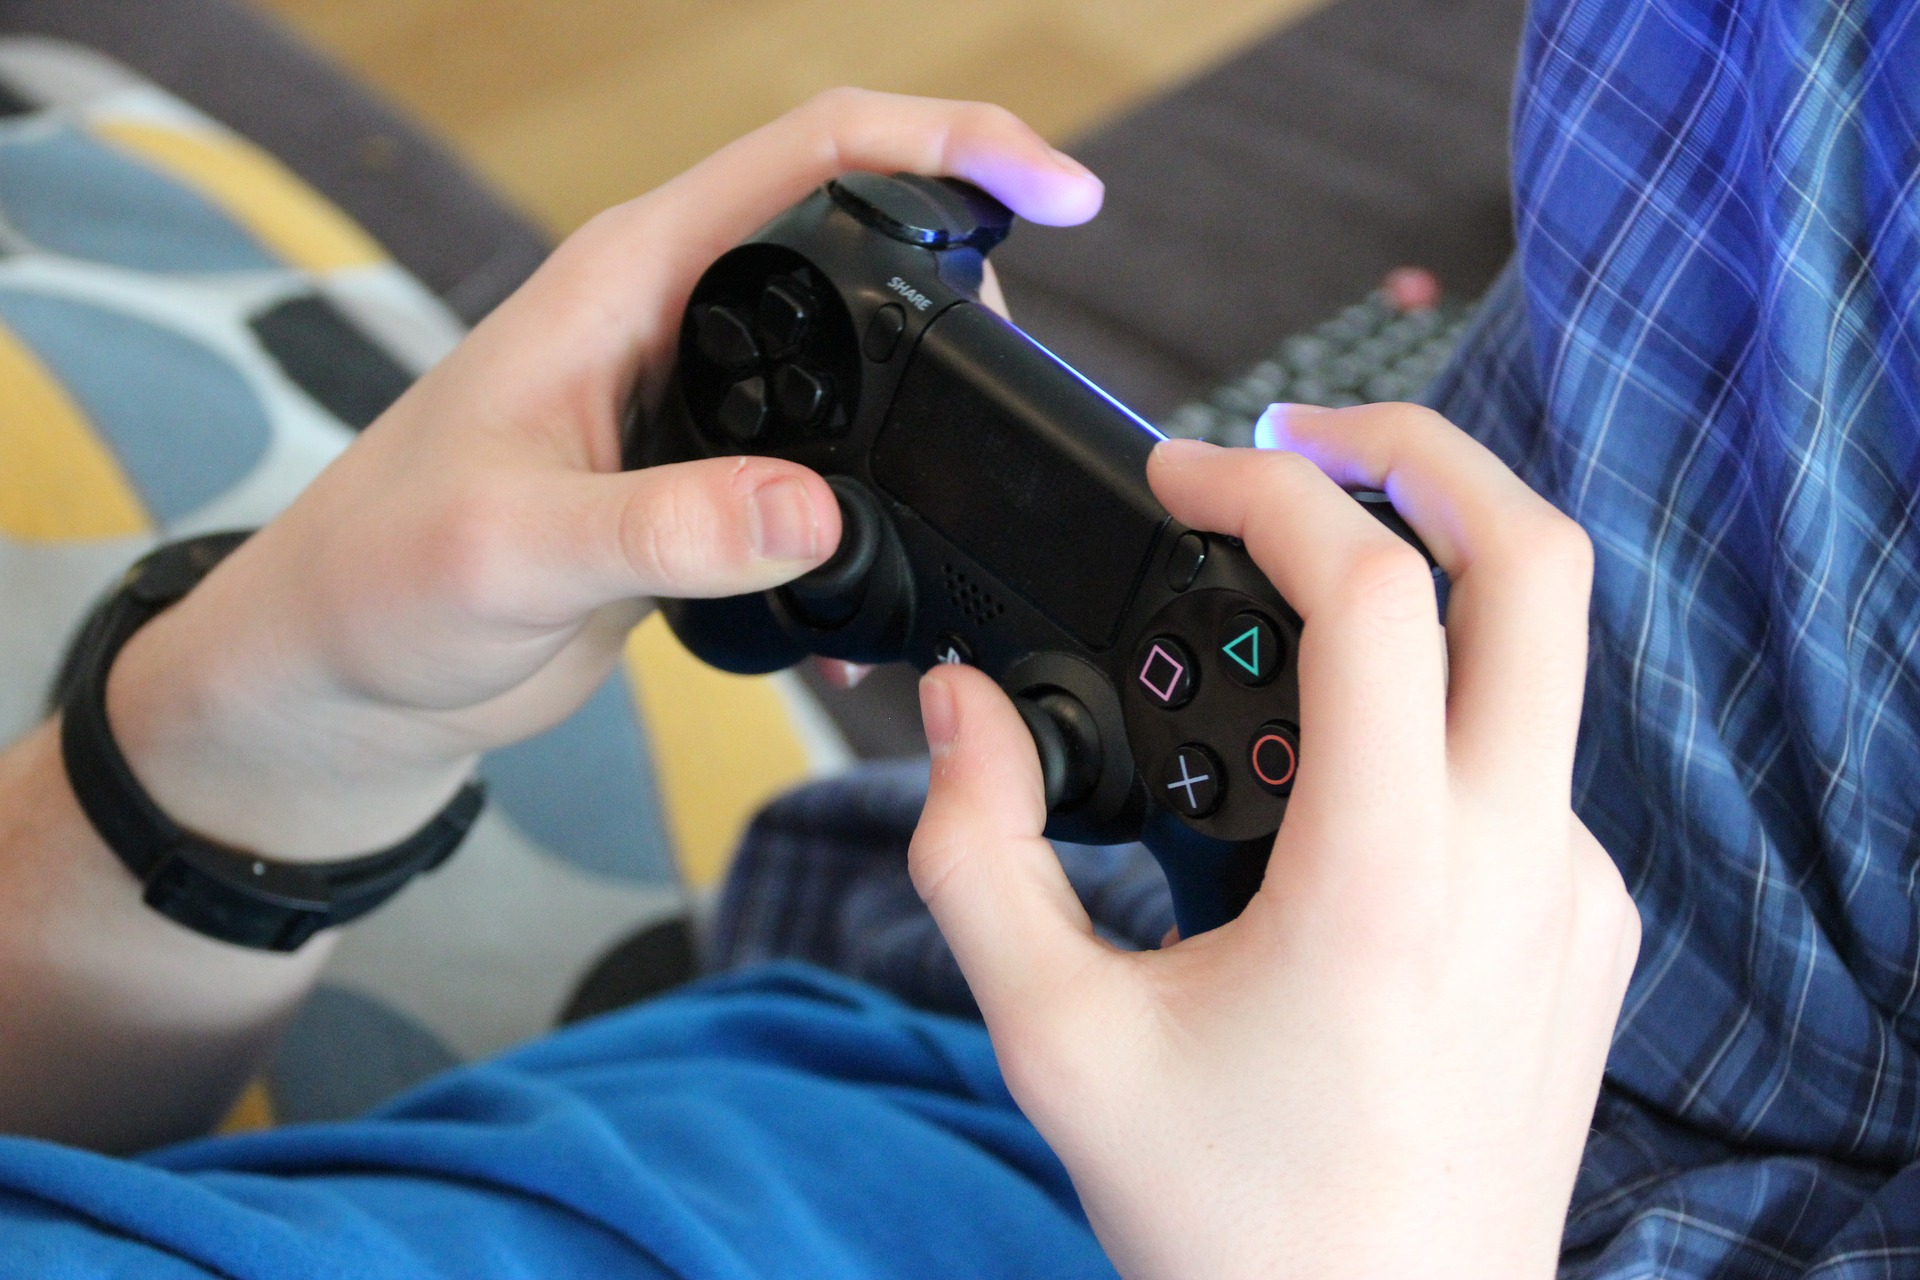 game-1232879_1920.jpg